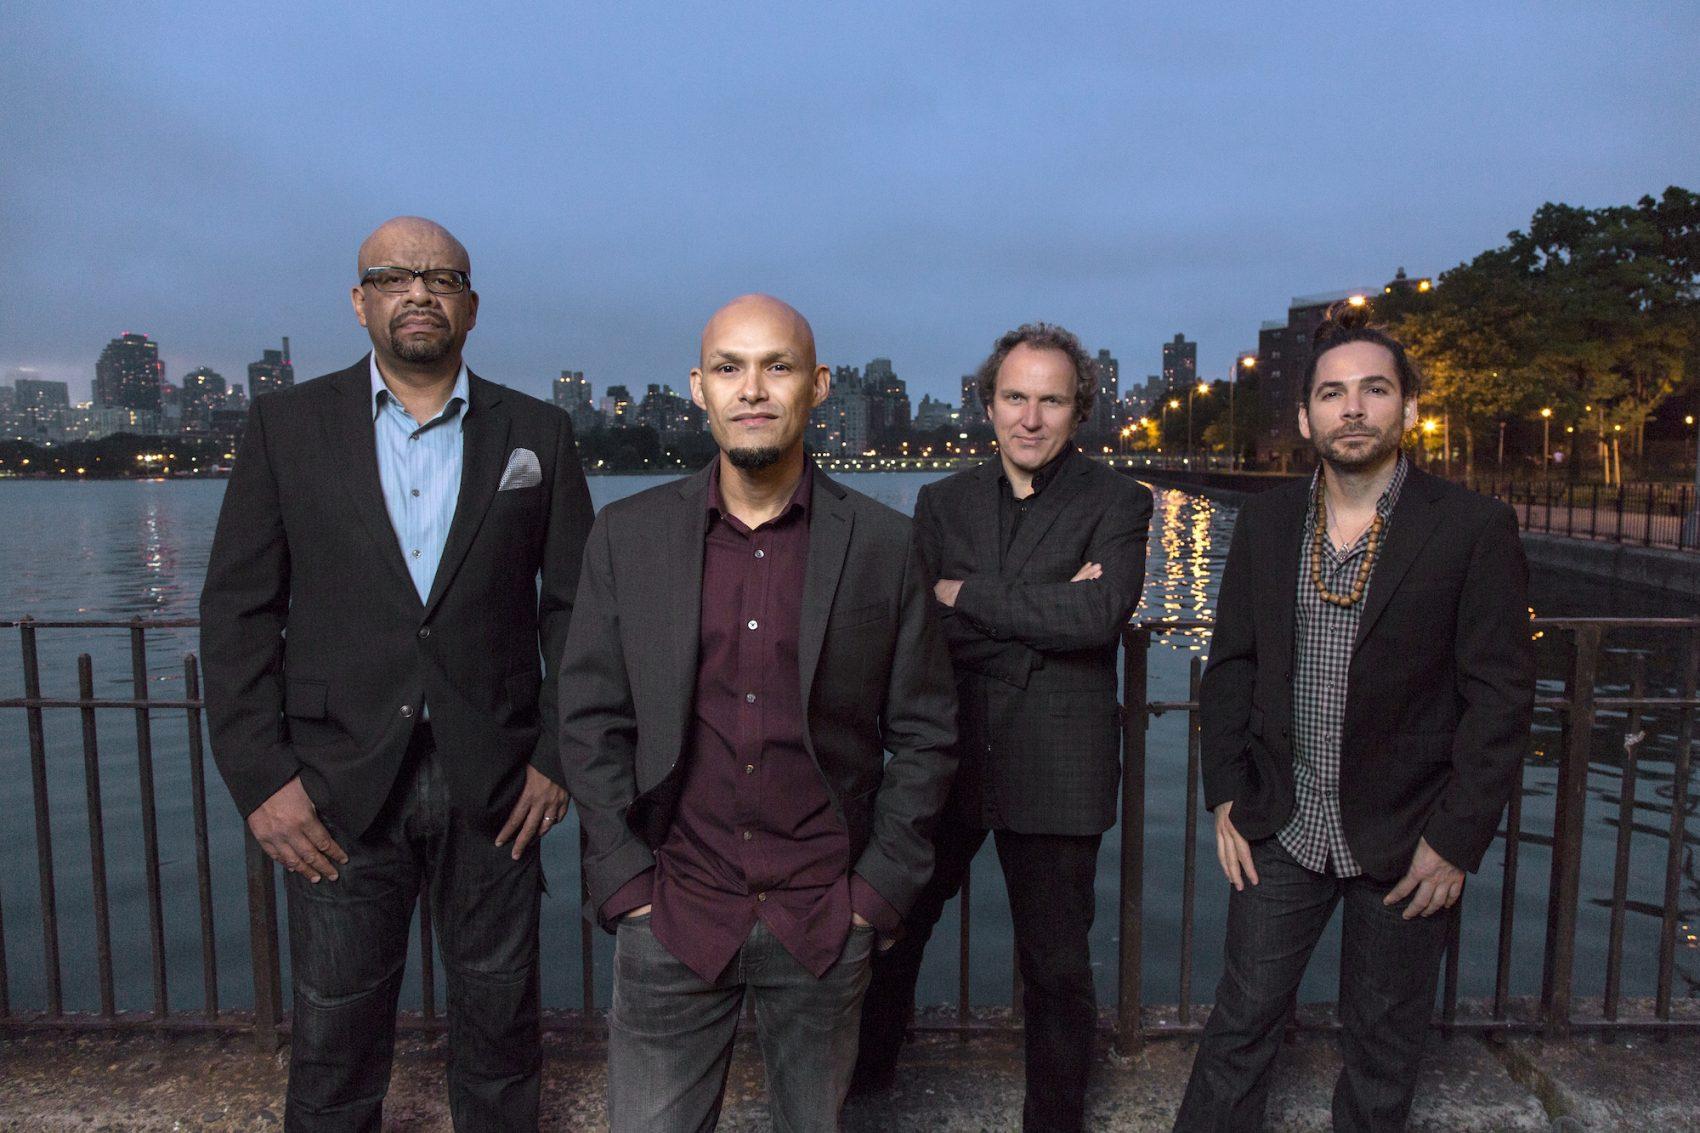 Pianist Luis Perdomo, saxophonist Miguel Zenón, bassist Hans Glawischnig and drummer Henry Cole. (Courtesy Jimmy Katz)